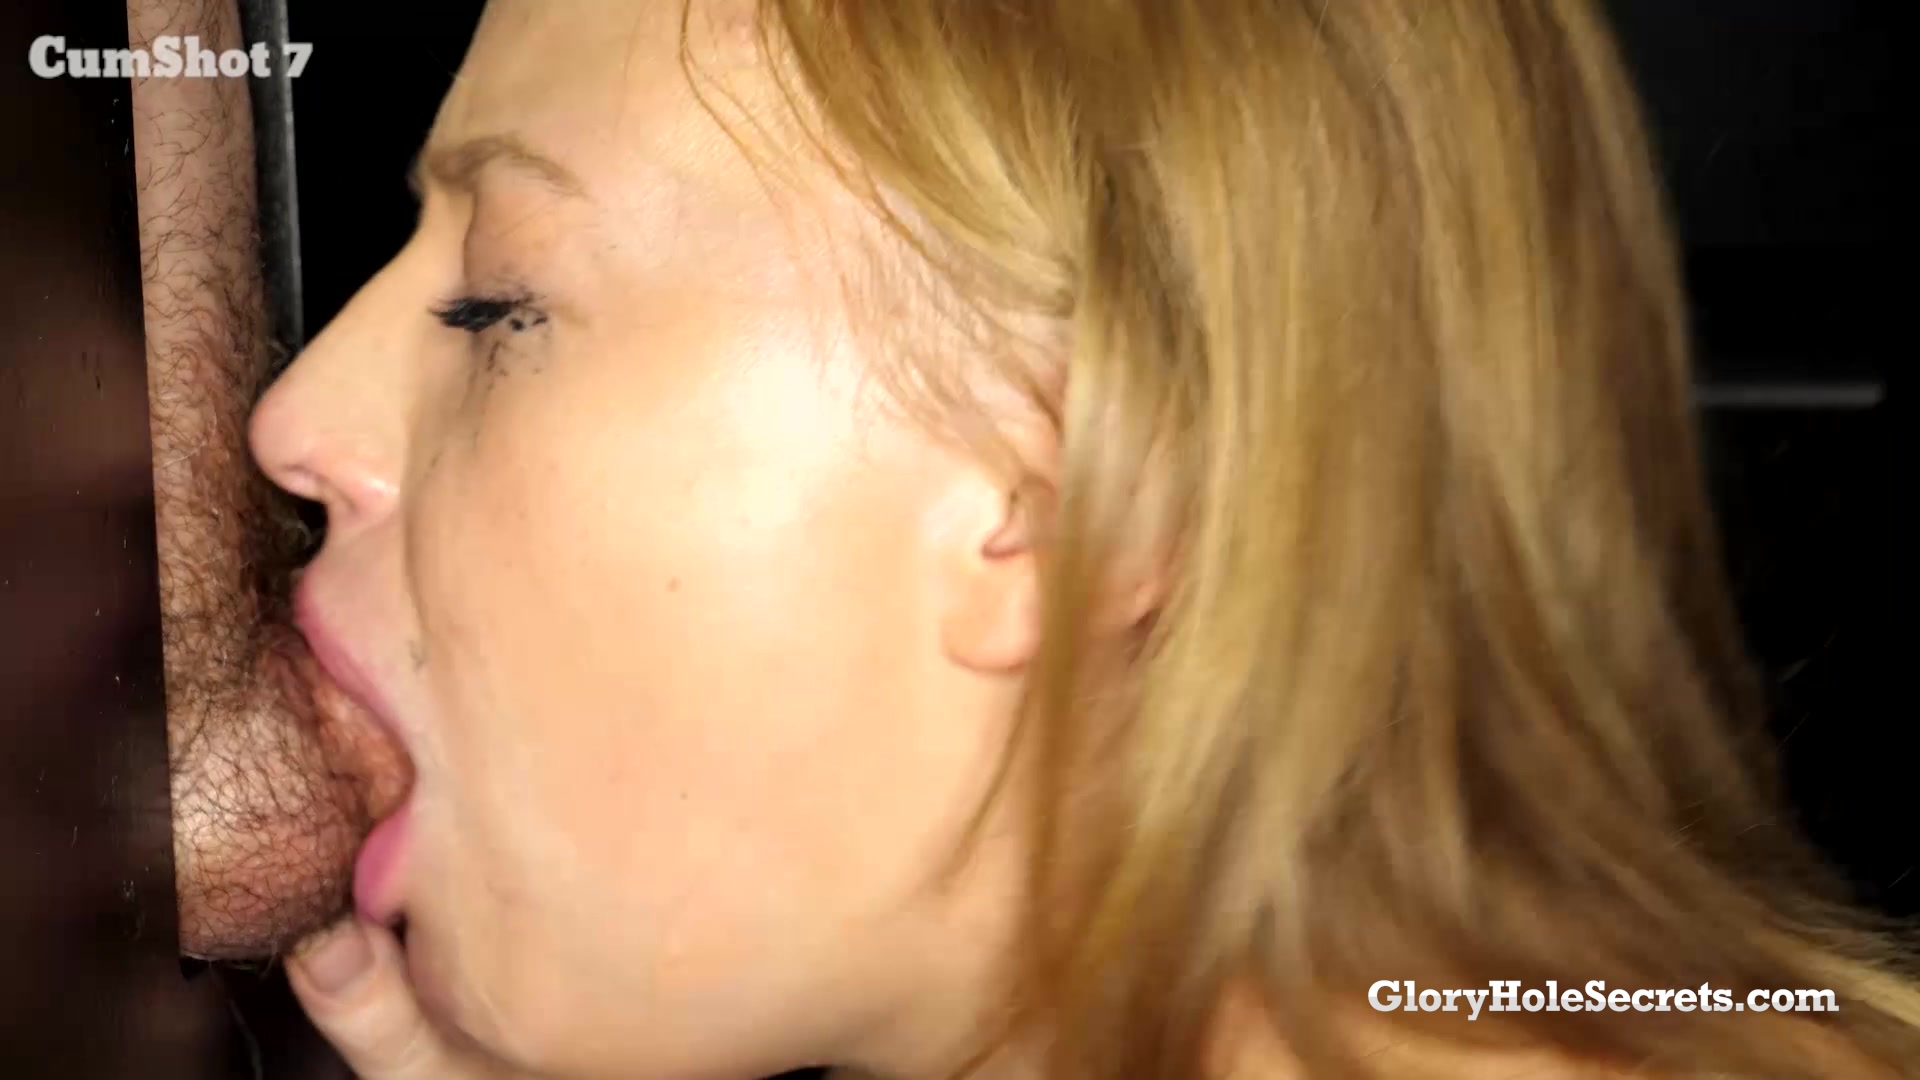 Porn tube Hot in cleveland lesbian